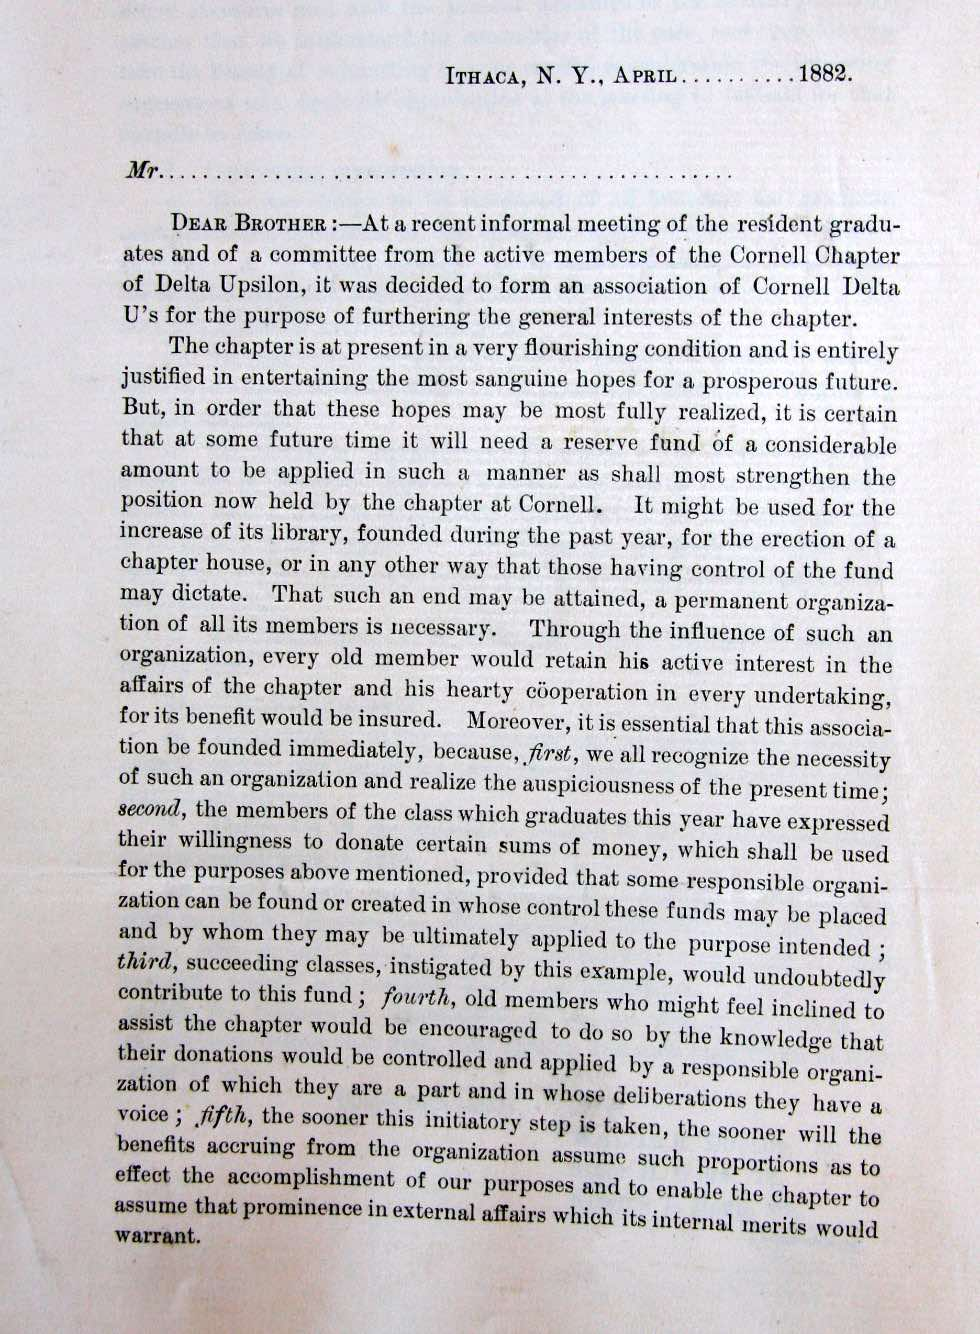 Alumni Circular Regarding CDUA's Founding 1882